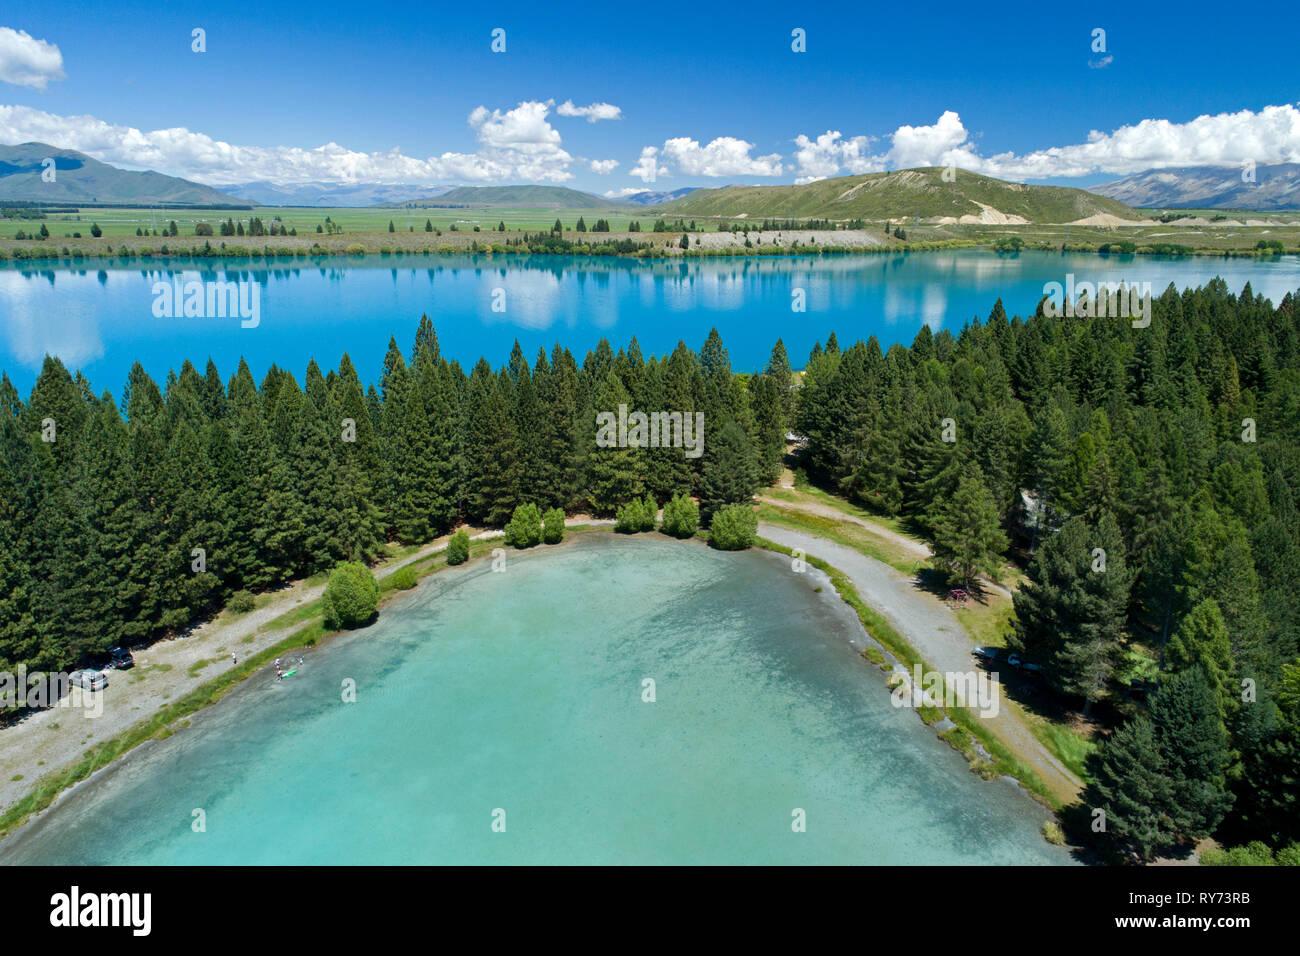 Lake Ruataniwha, Mackenzie Country, South Island, New Zealand - aerial - Stock Image